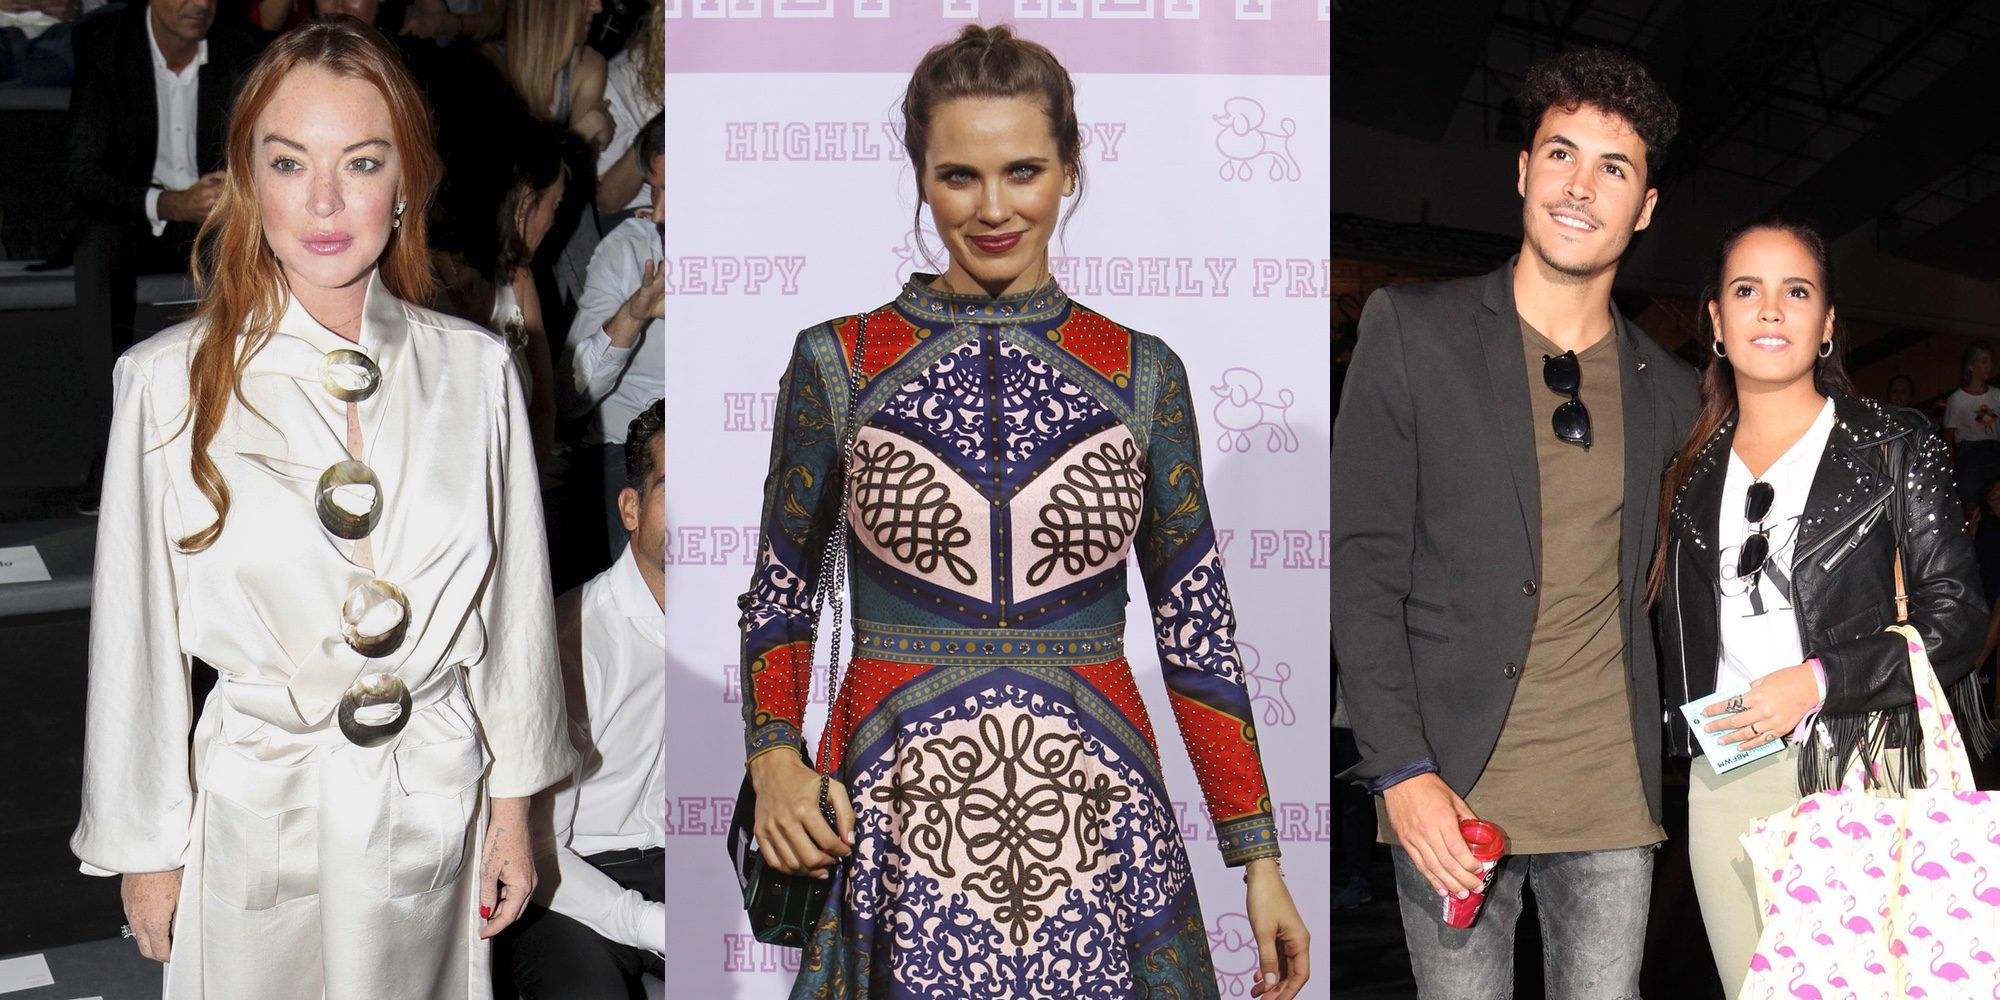 Gloria Camila y Kiko, Lindsay Lohan... Los famosos no pierden detalle en la Madrid Fashion Week